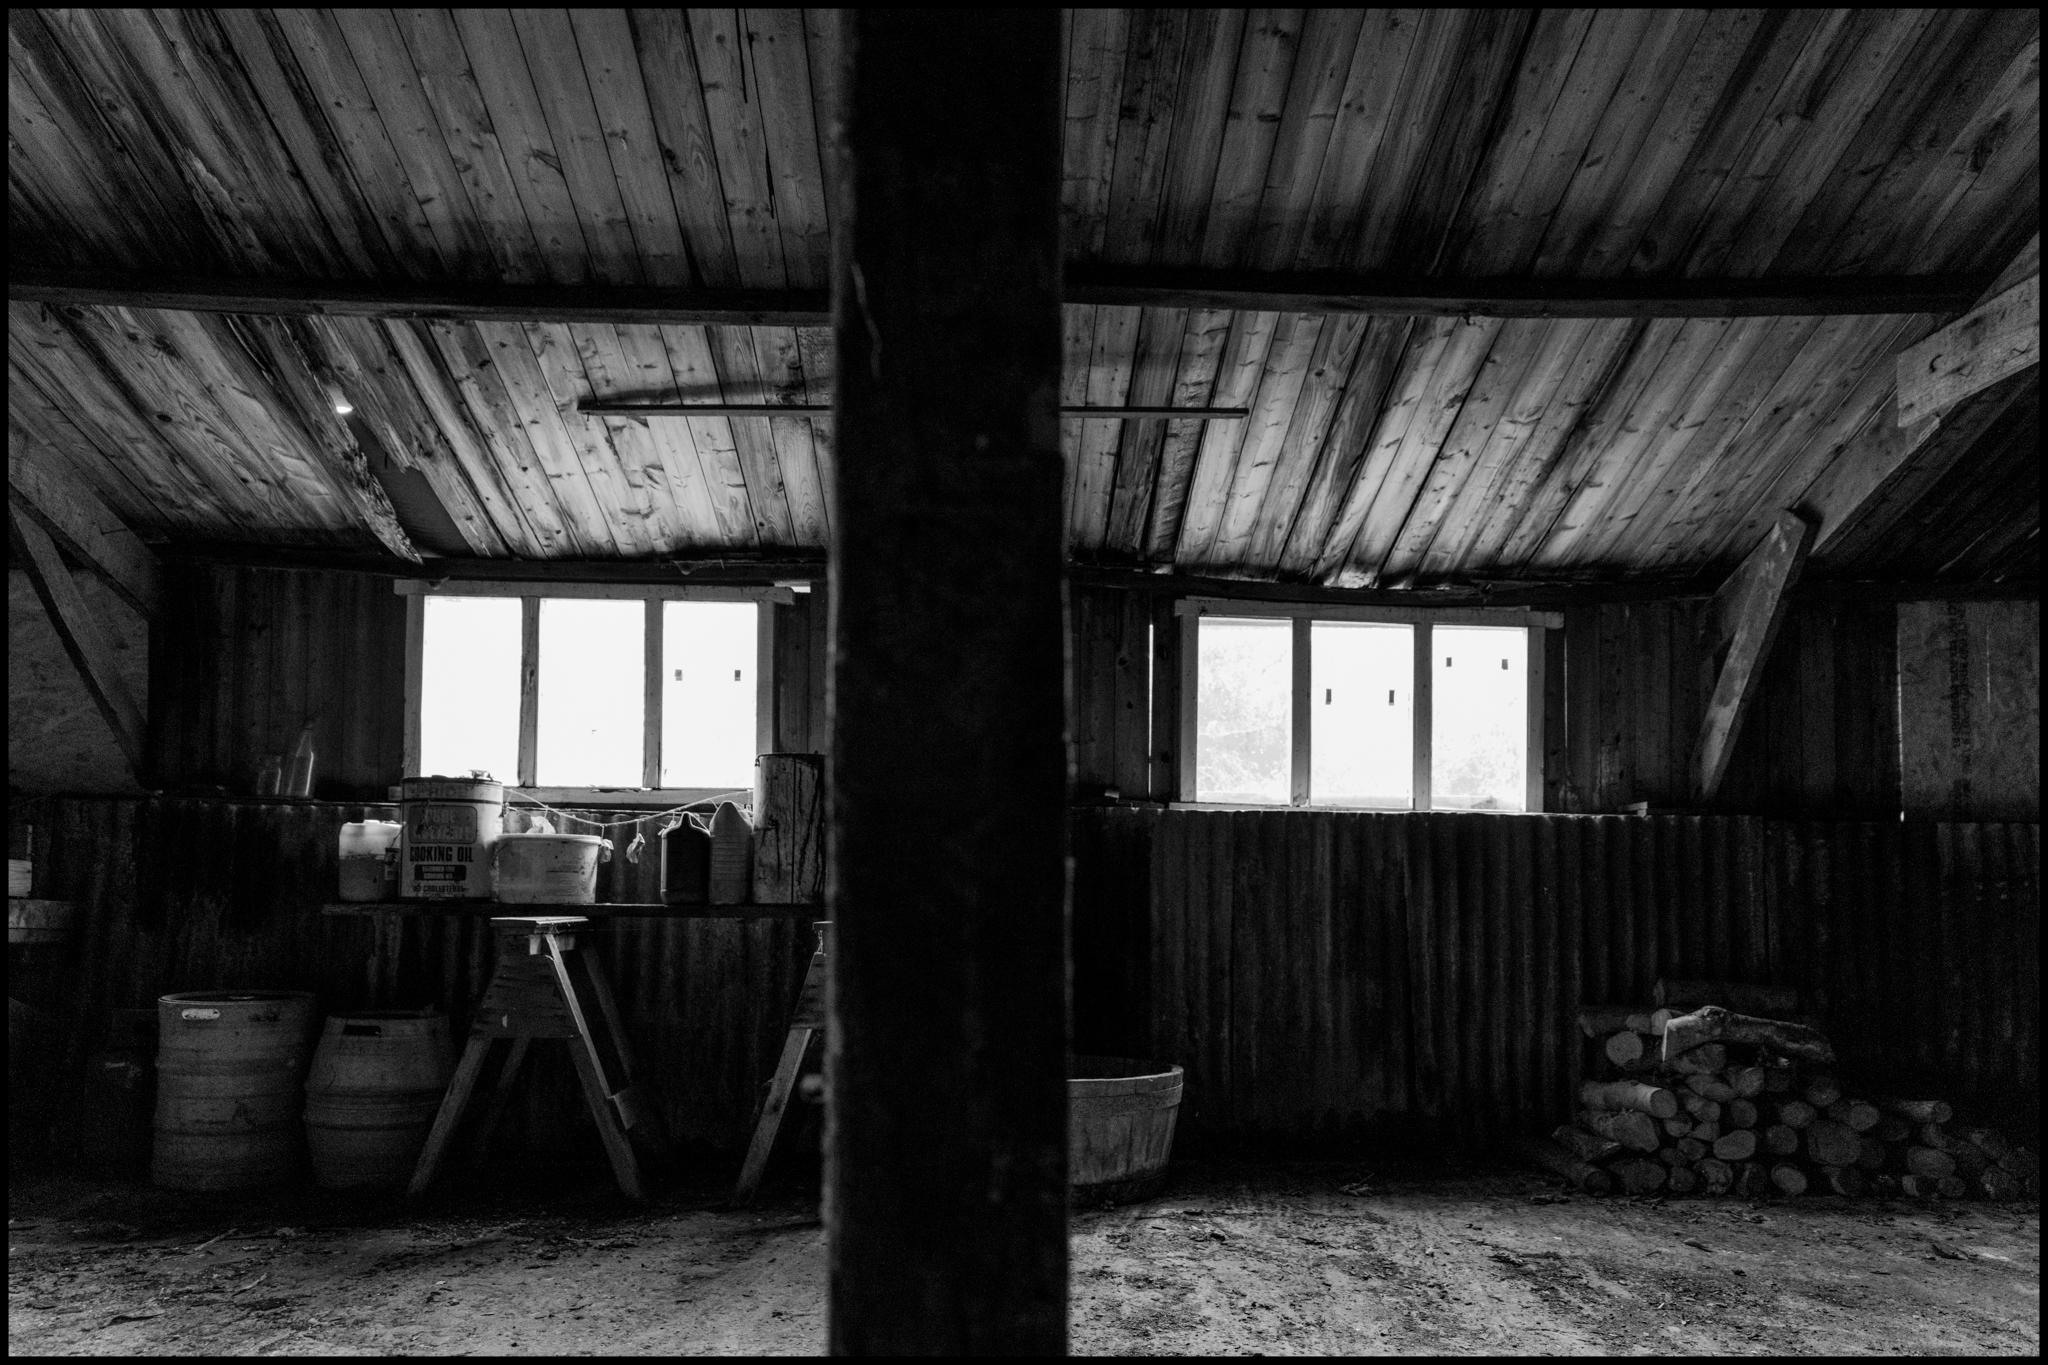 10 May 2019 - Barn #2, Whitle UK